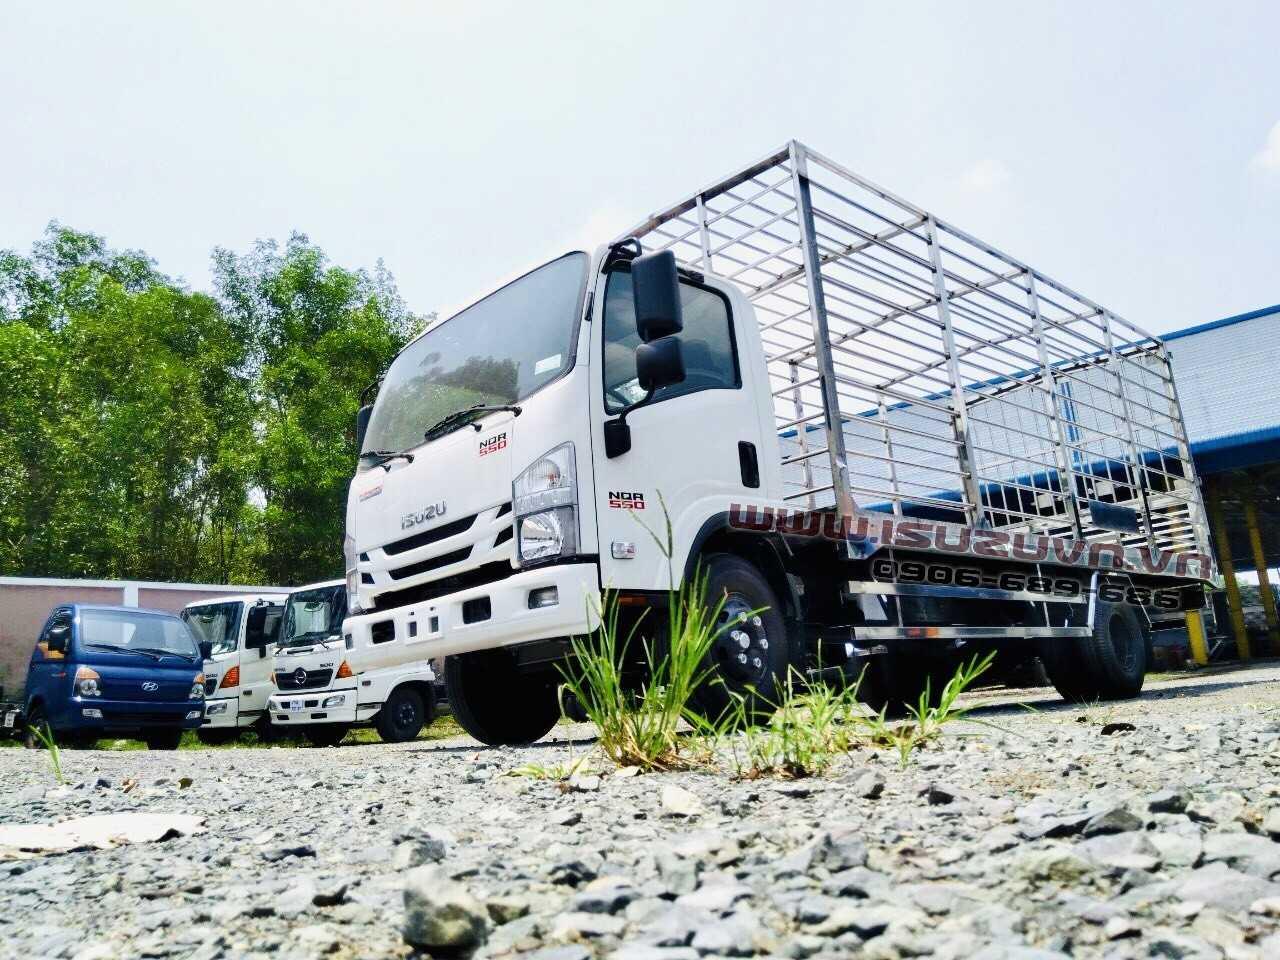 NQR75LE4__Xe thùng chở gia cầm có lồng 4600kg (2)